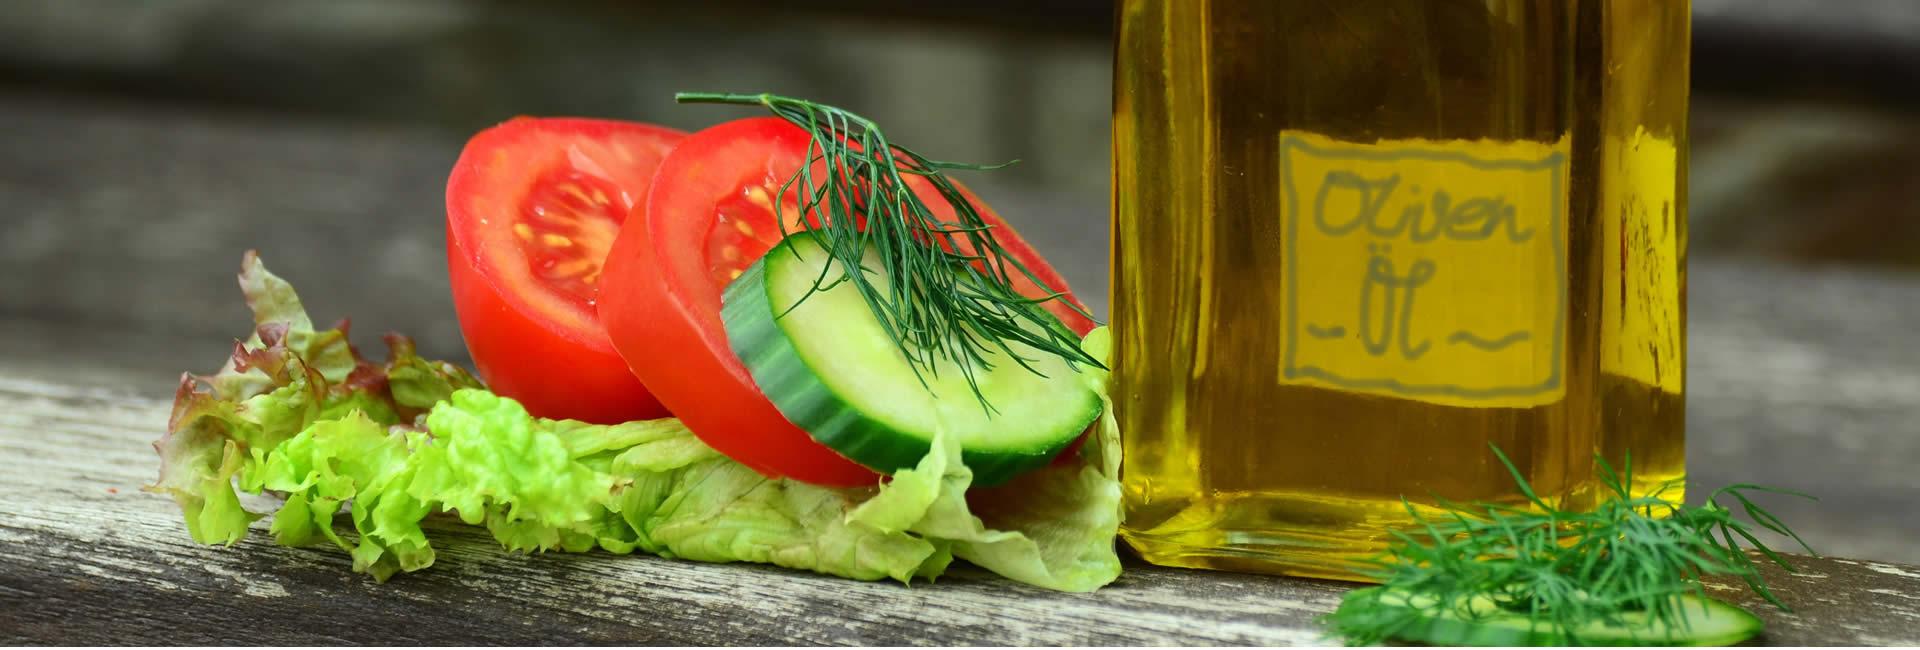 dietologi cremona - olii vegetali